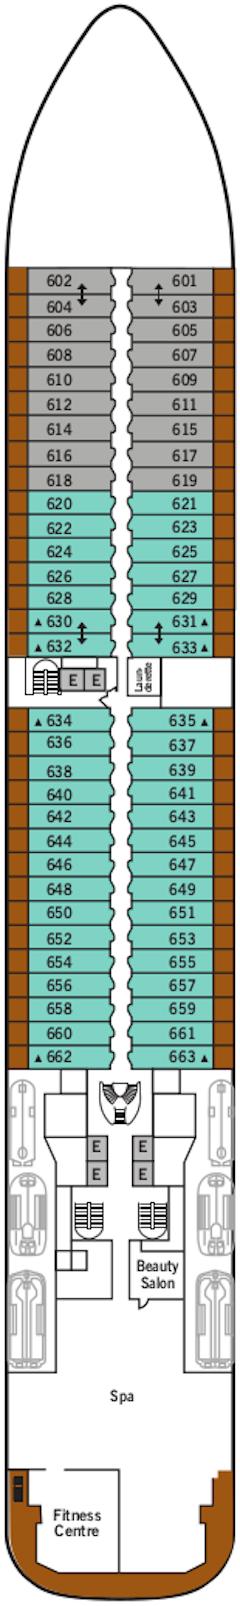 Silver Dawn Deck 6 Deck Plan